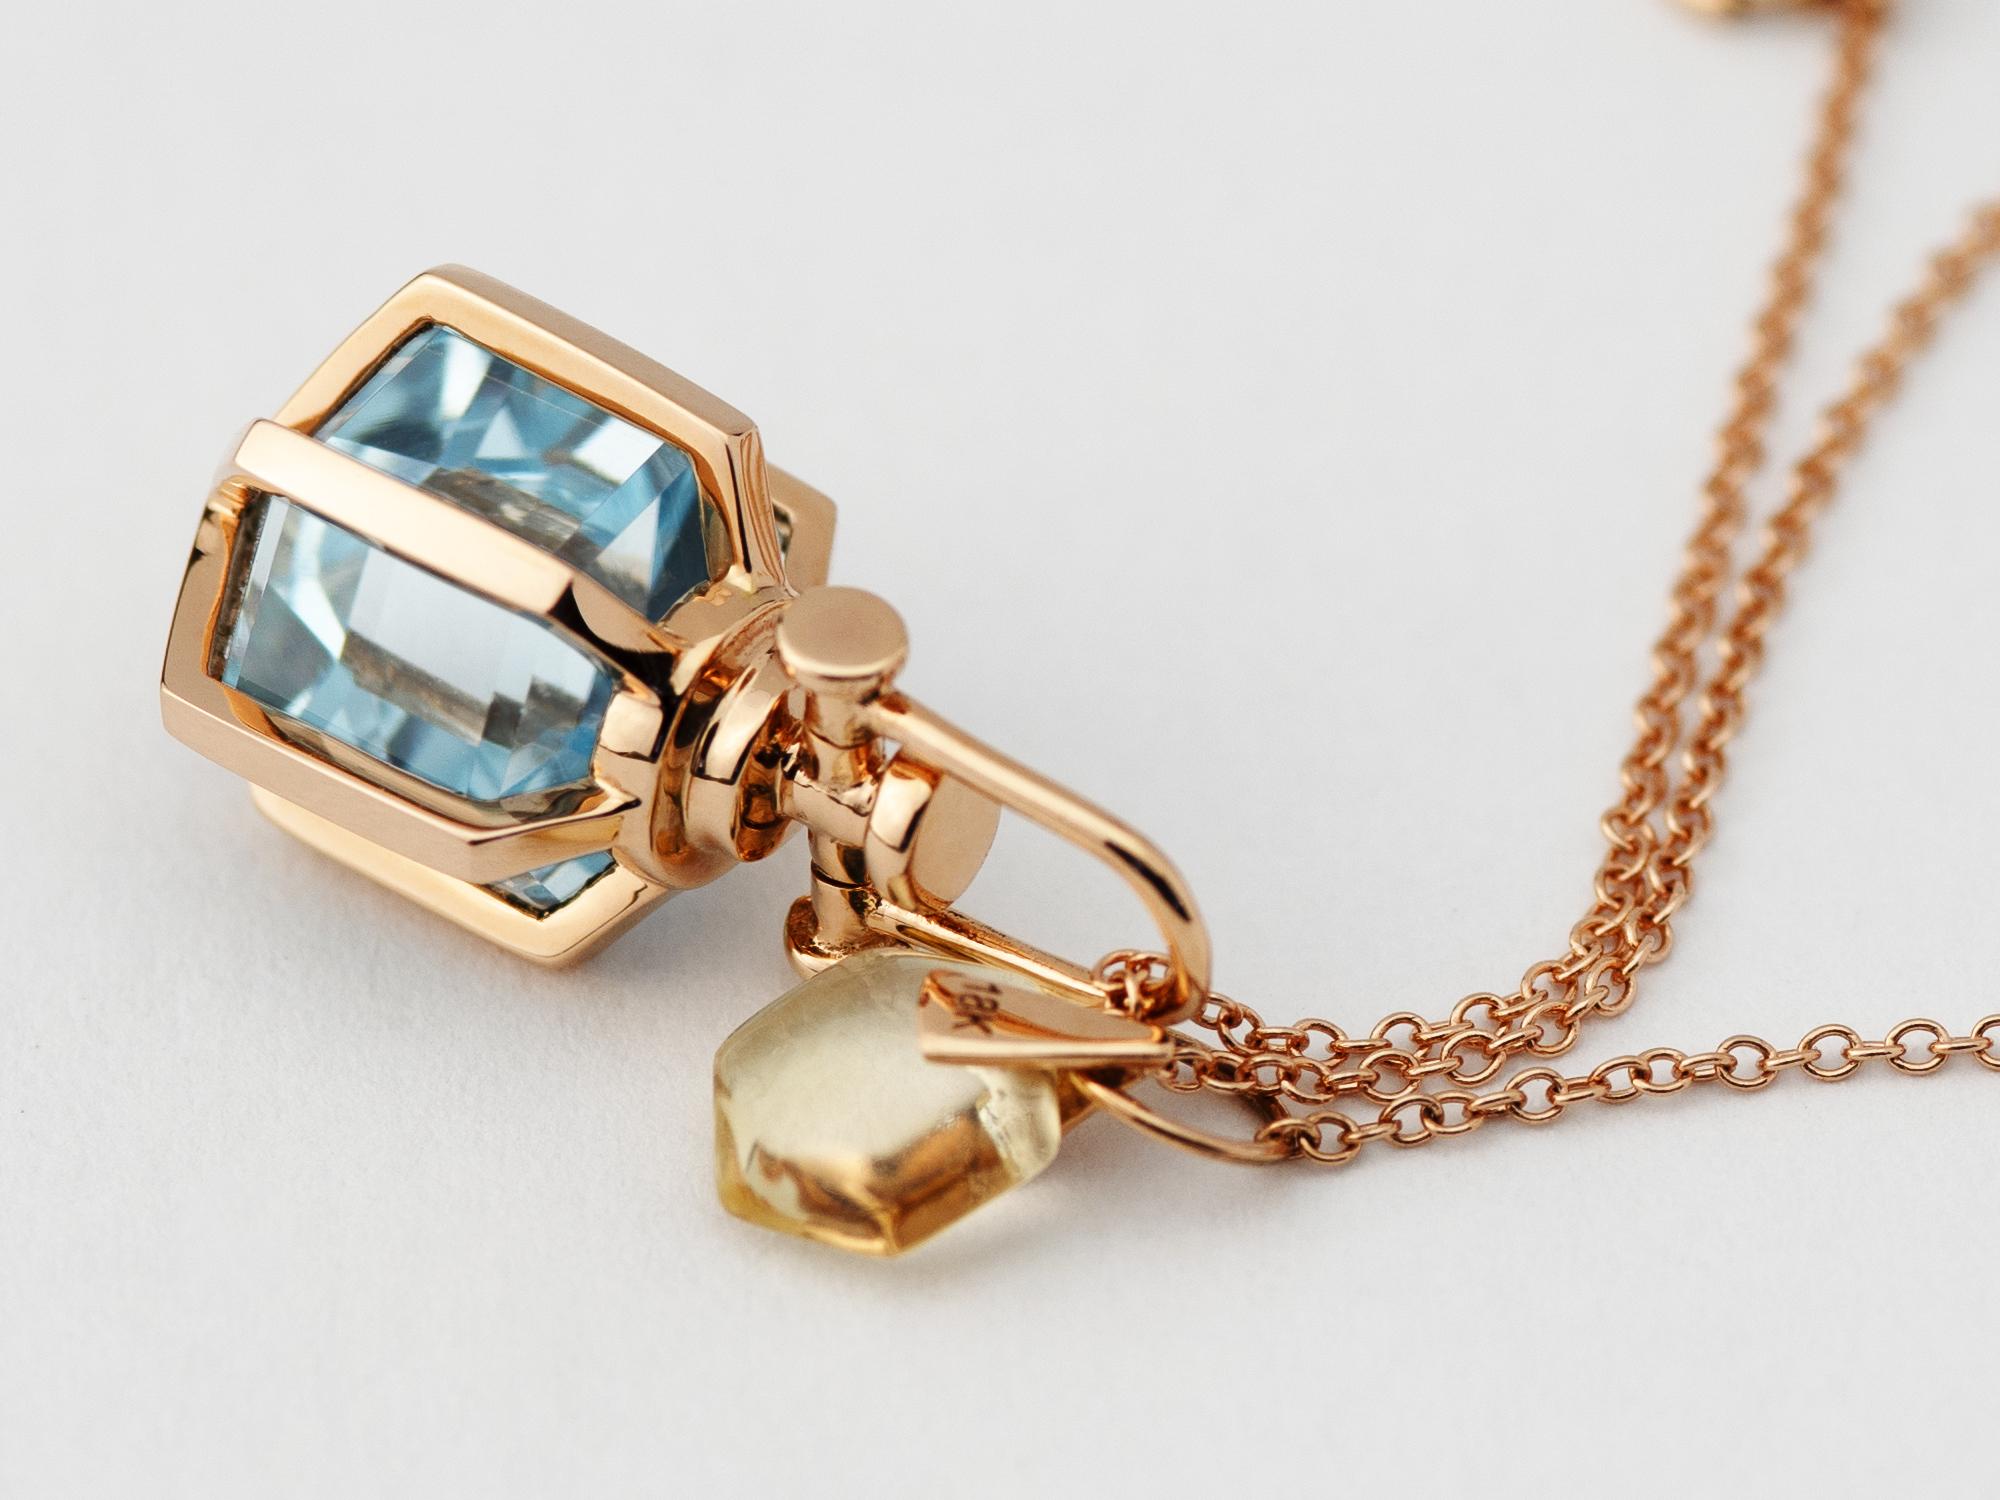 Rebecca Li Six Senses Talisman Pendant Necklace Mini, 18k Rose Gold with Natural Blue Topaz